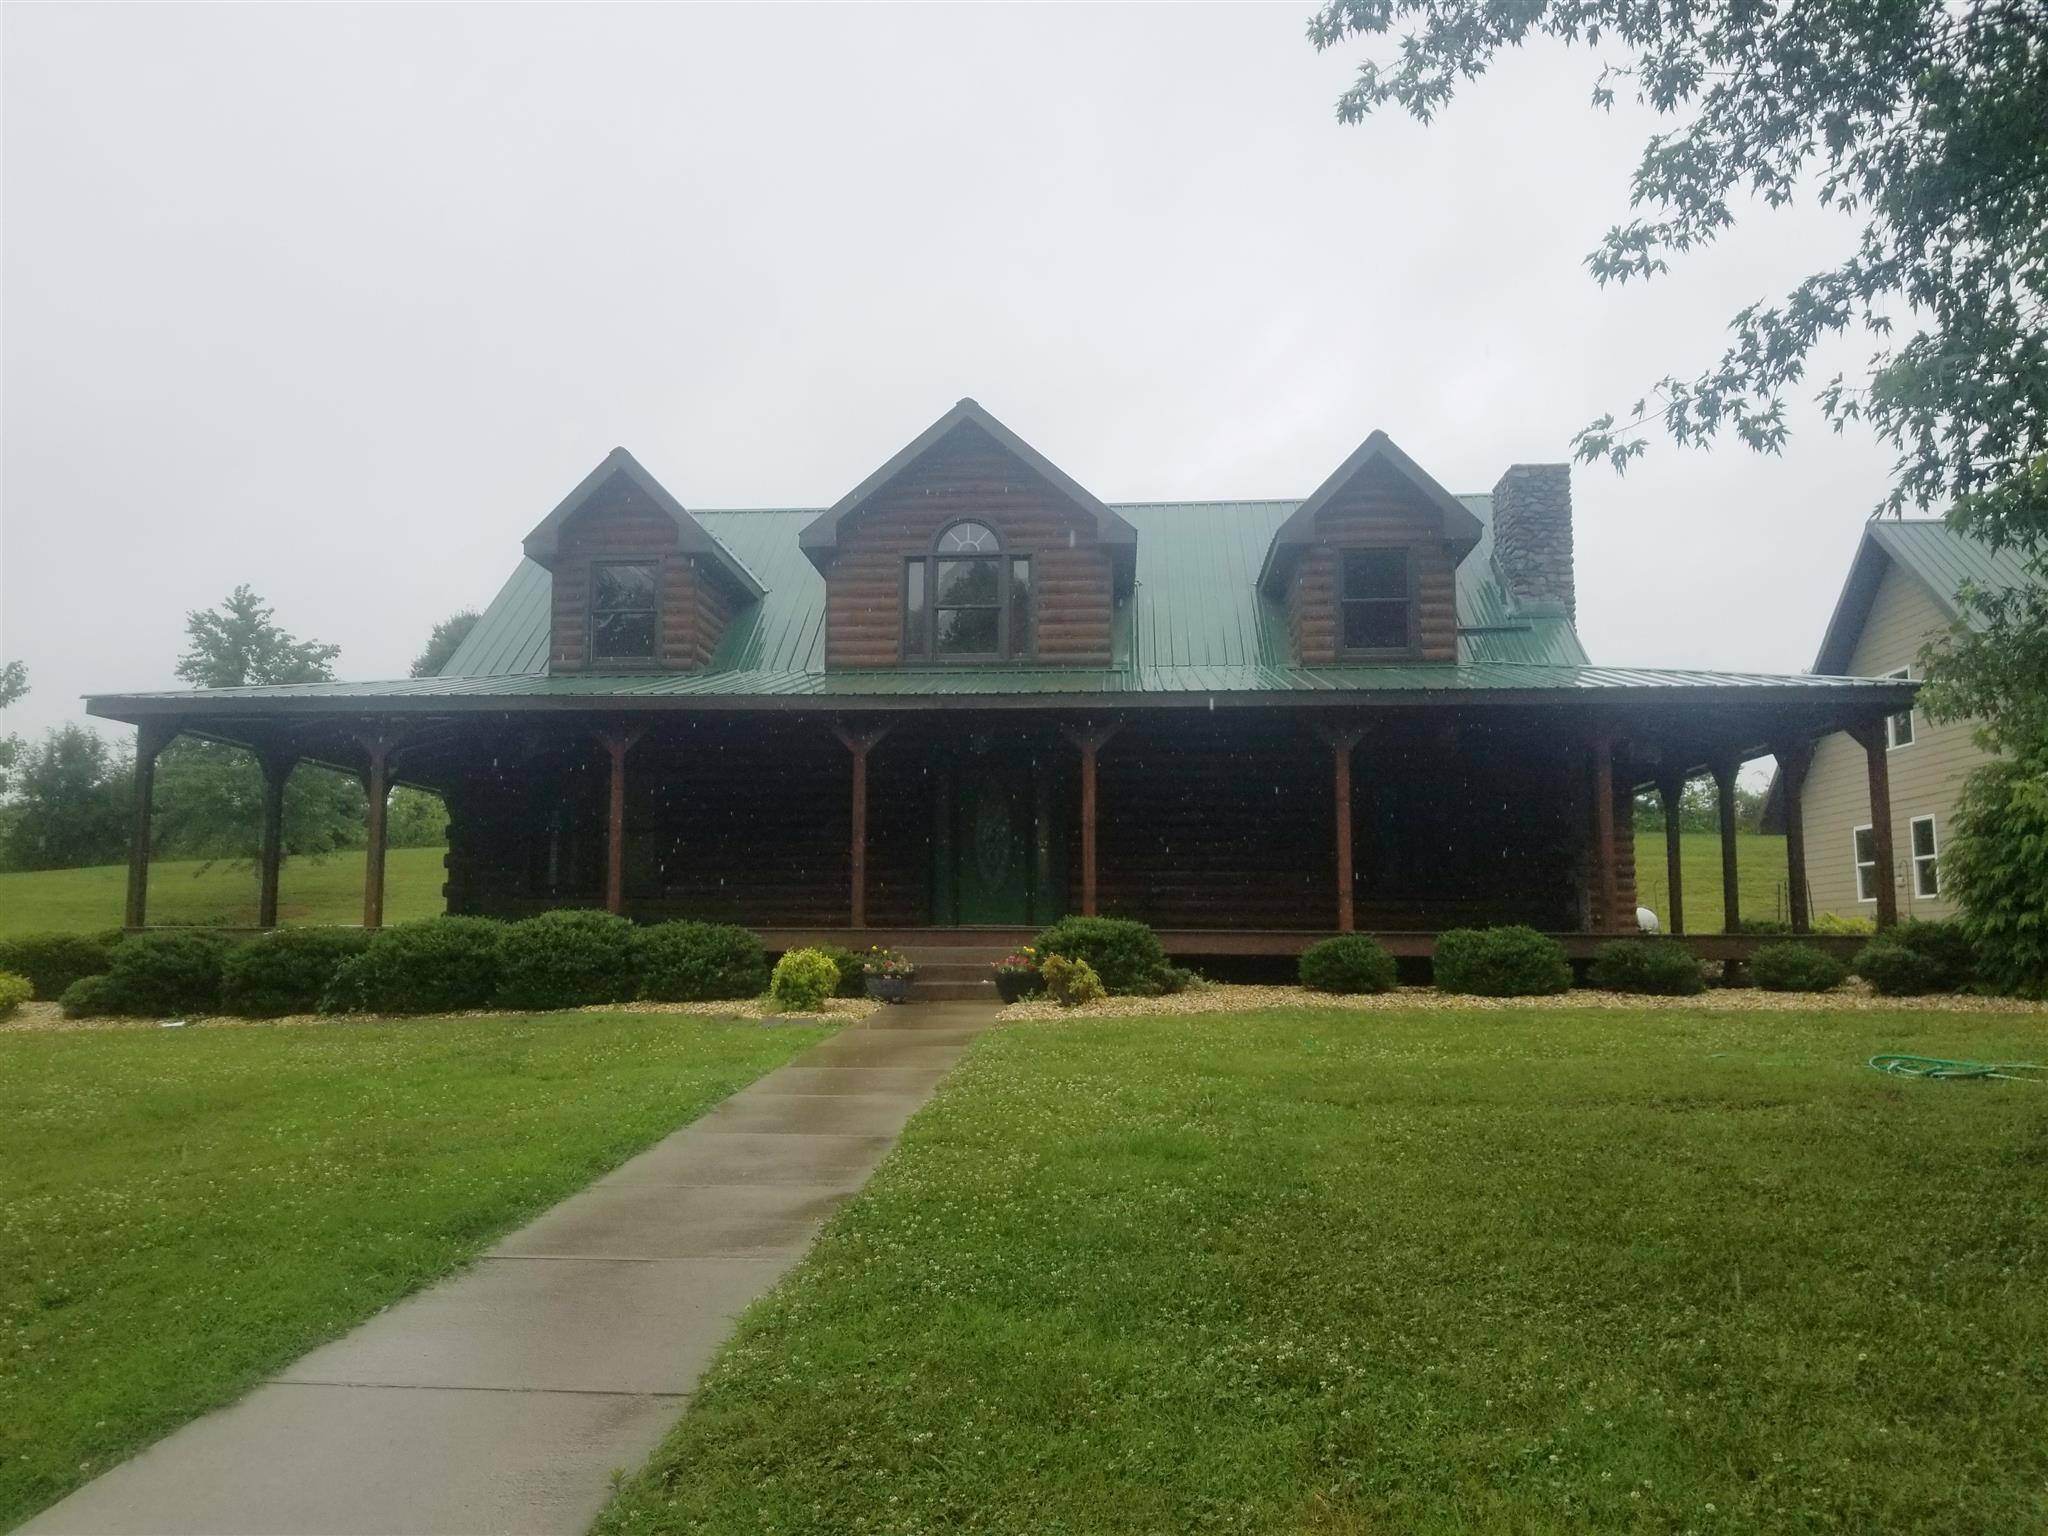 6453 Hoods Branch Rd, Springfield, TN 37172 - Springfield, TN real estate listing